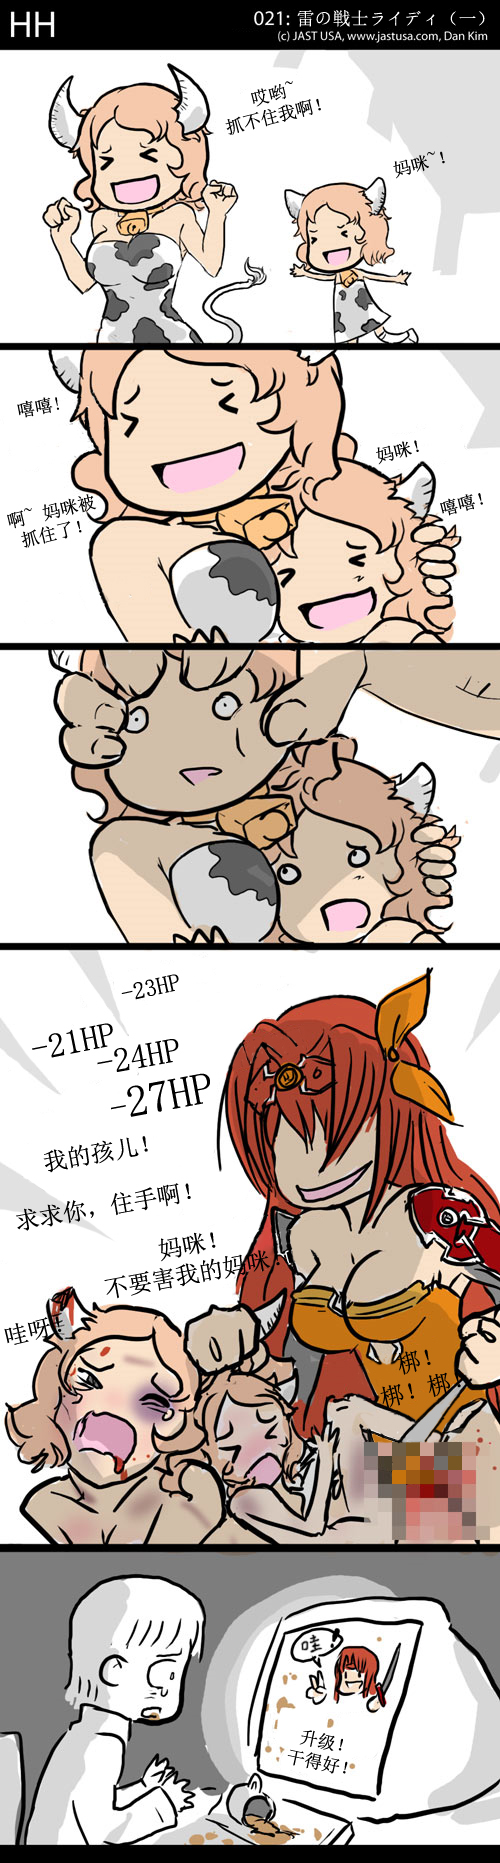 [HH - strip 21]